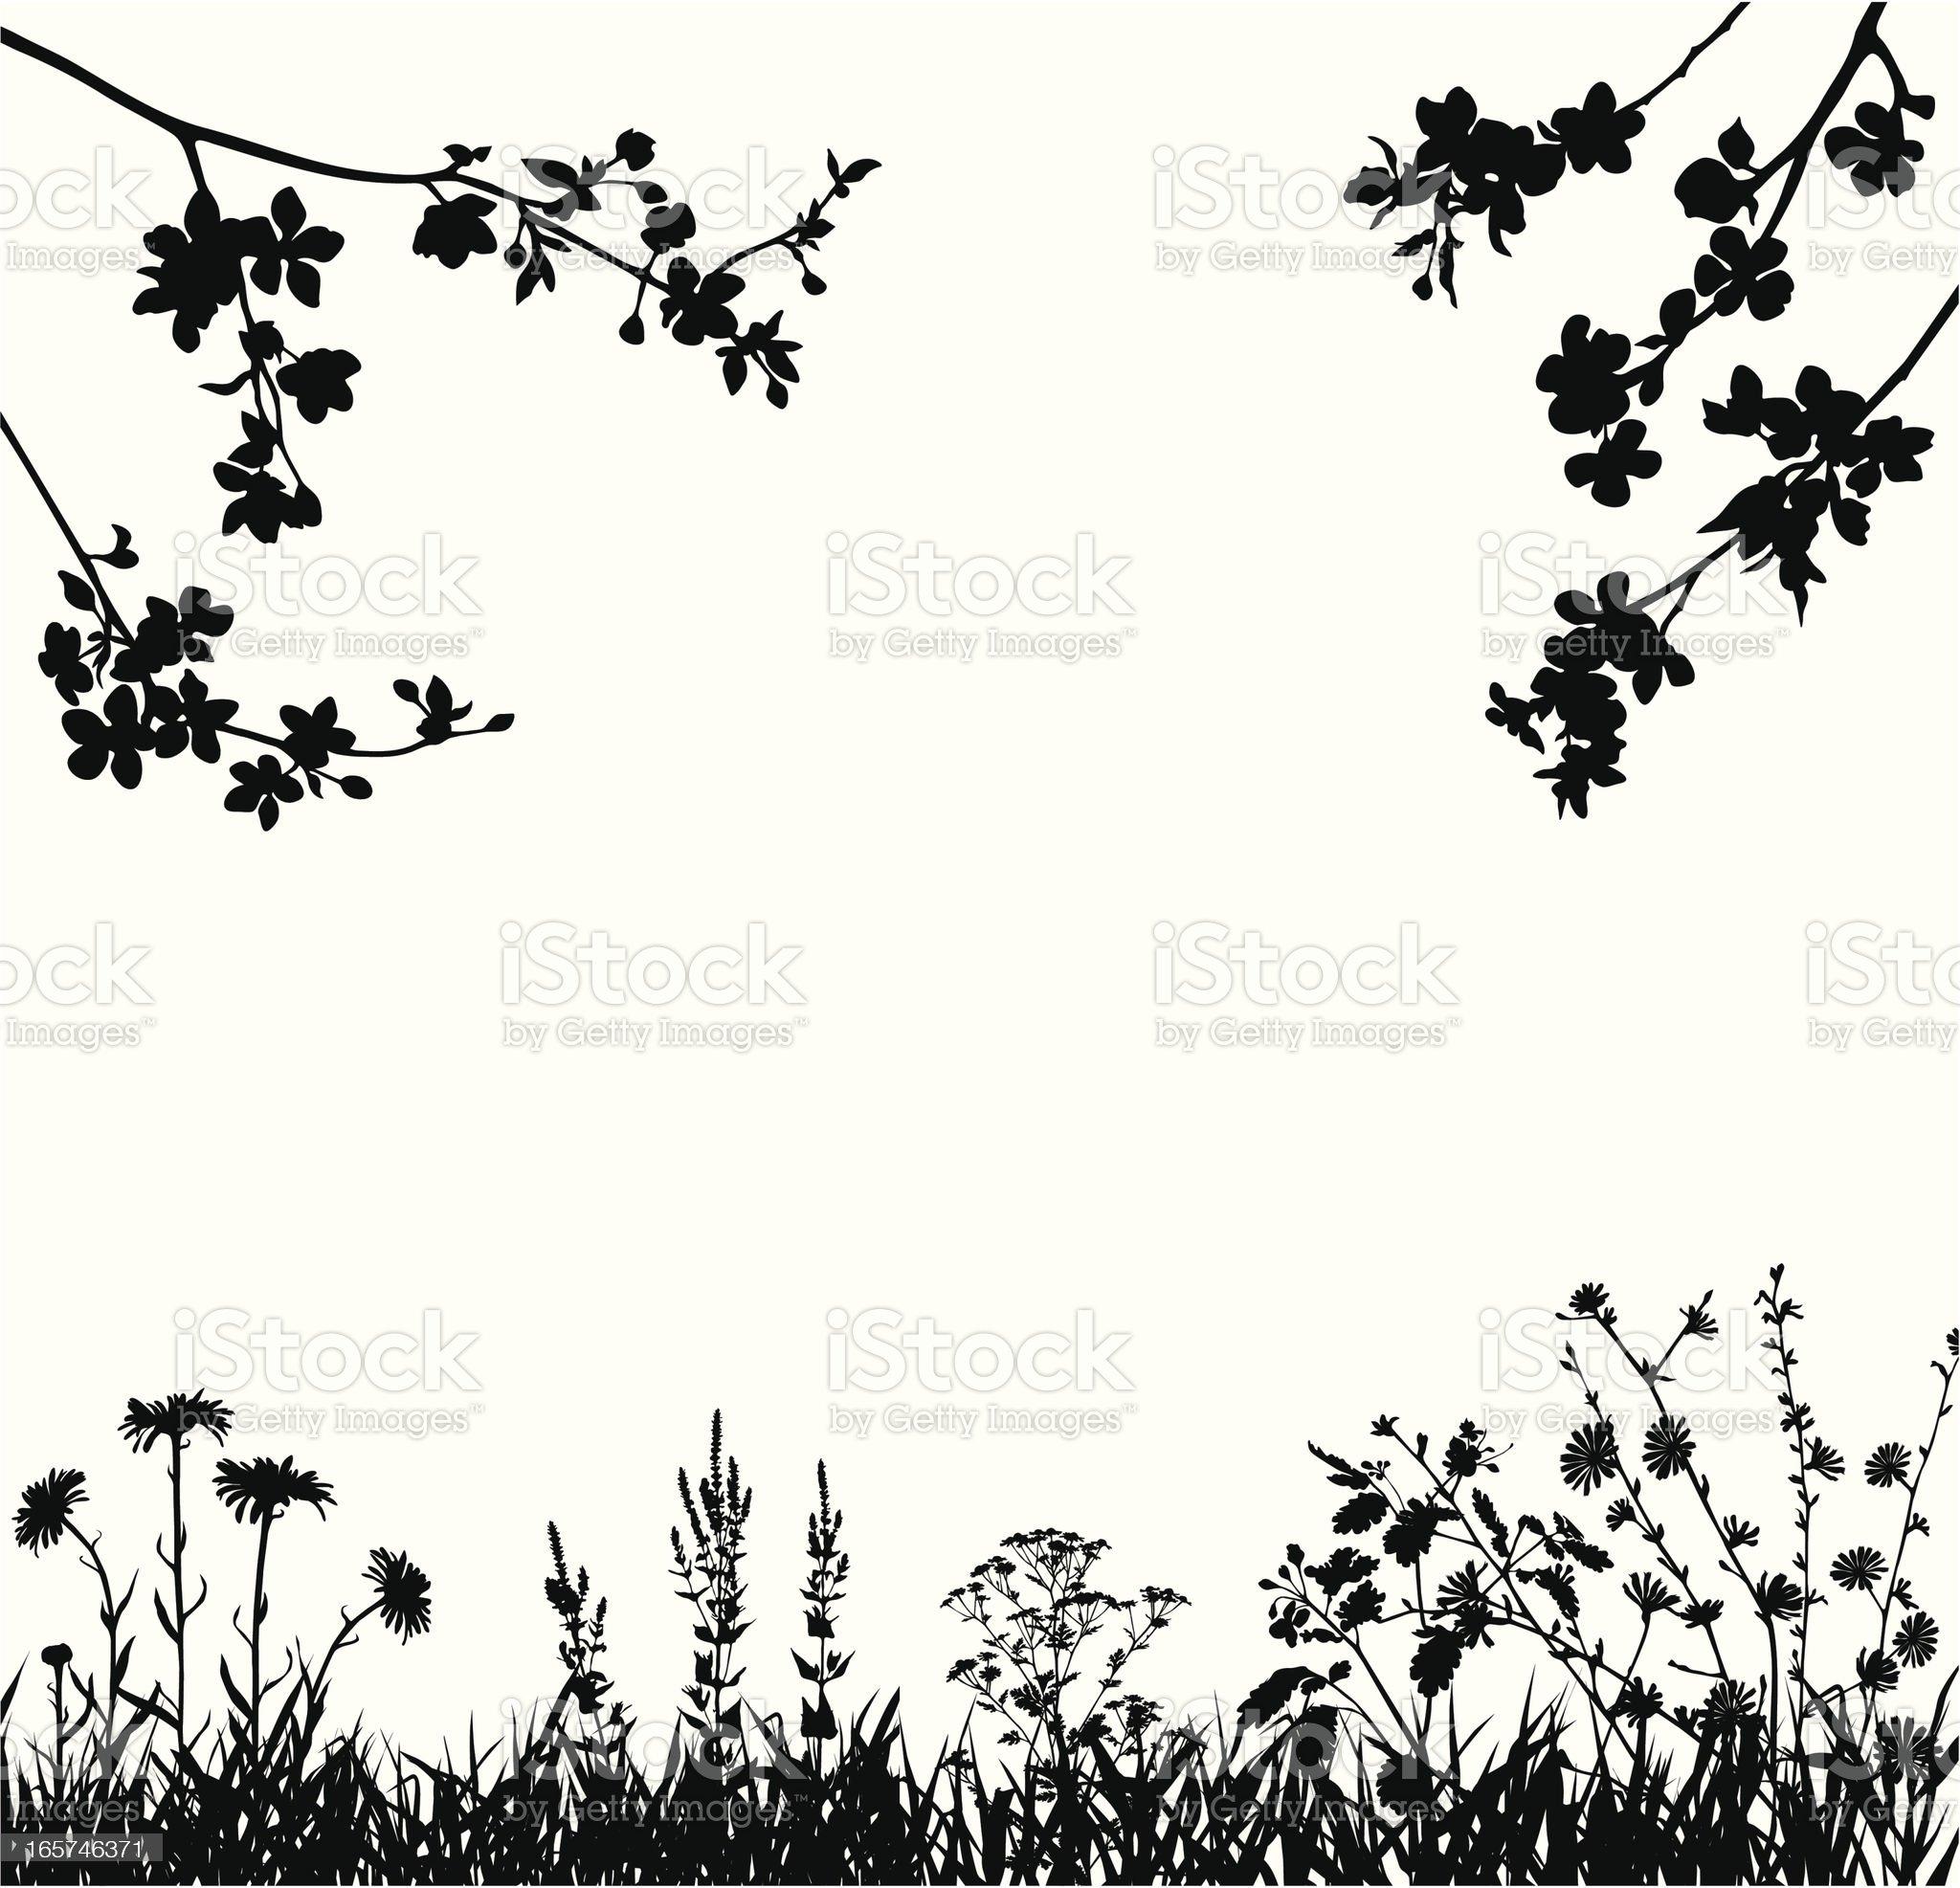 Spring blossomed garden royalty-free stock vector art